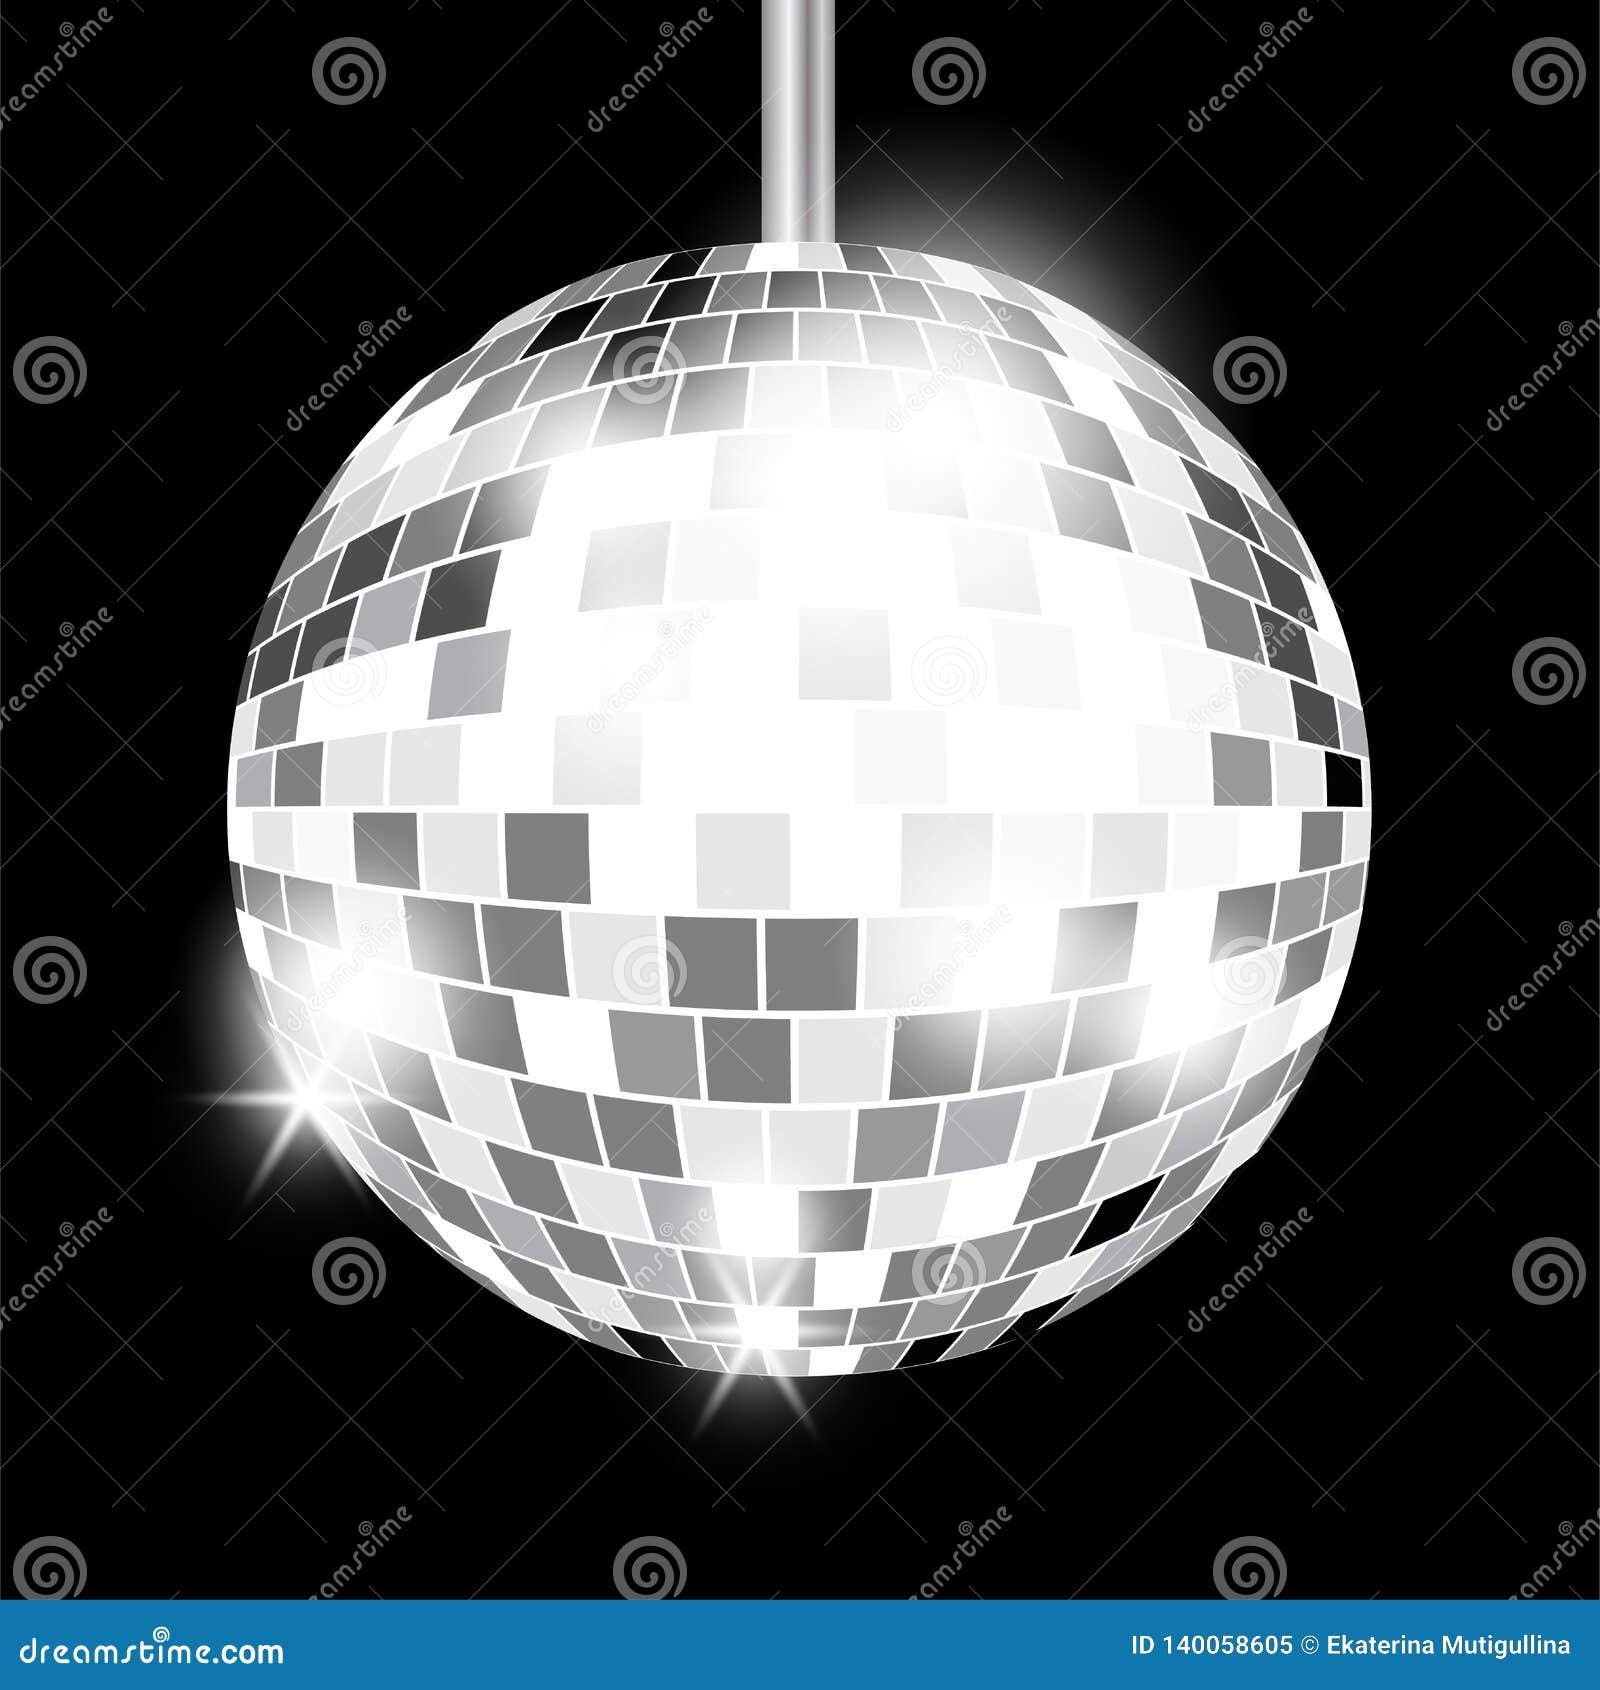 Silver mirror disco ball isolated